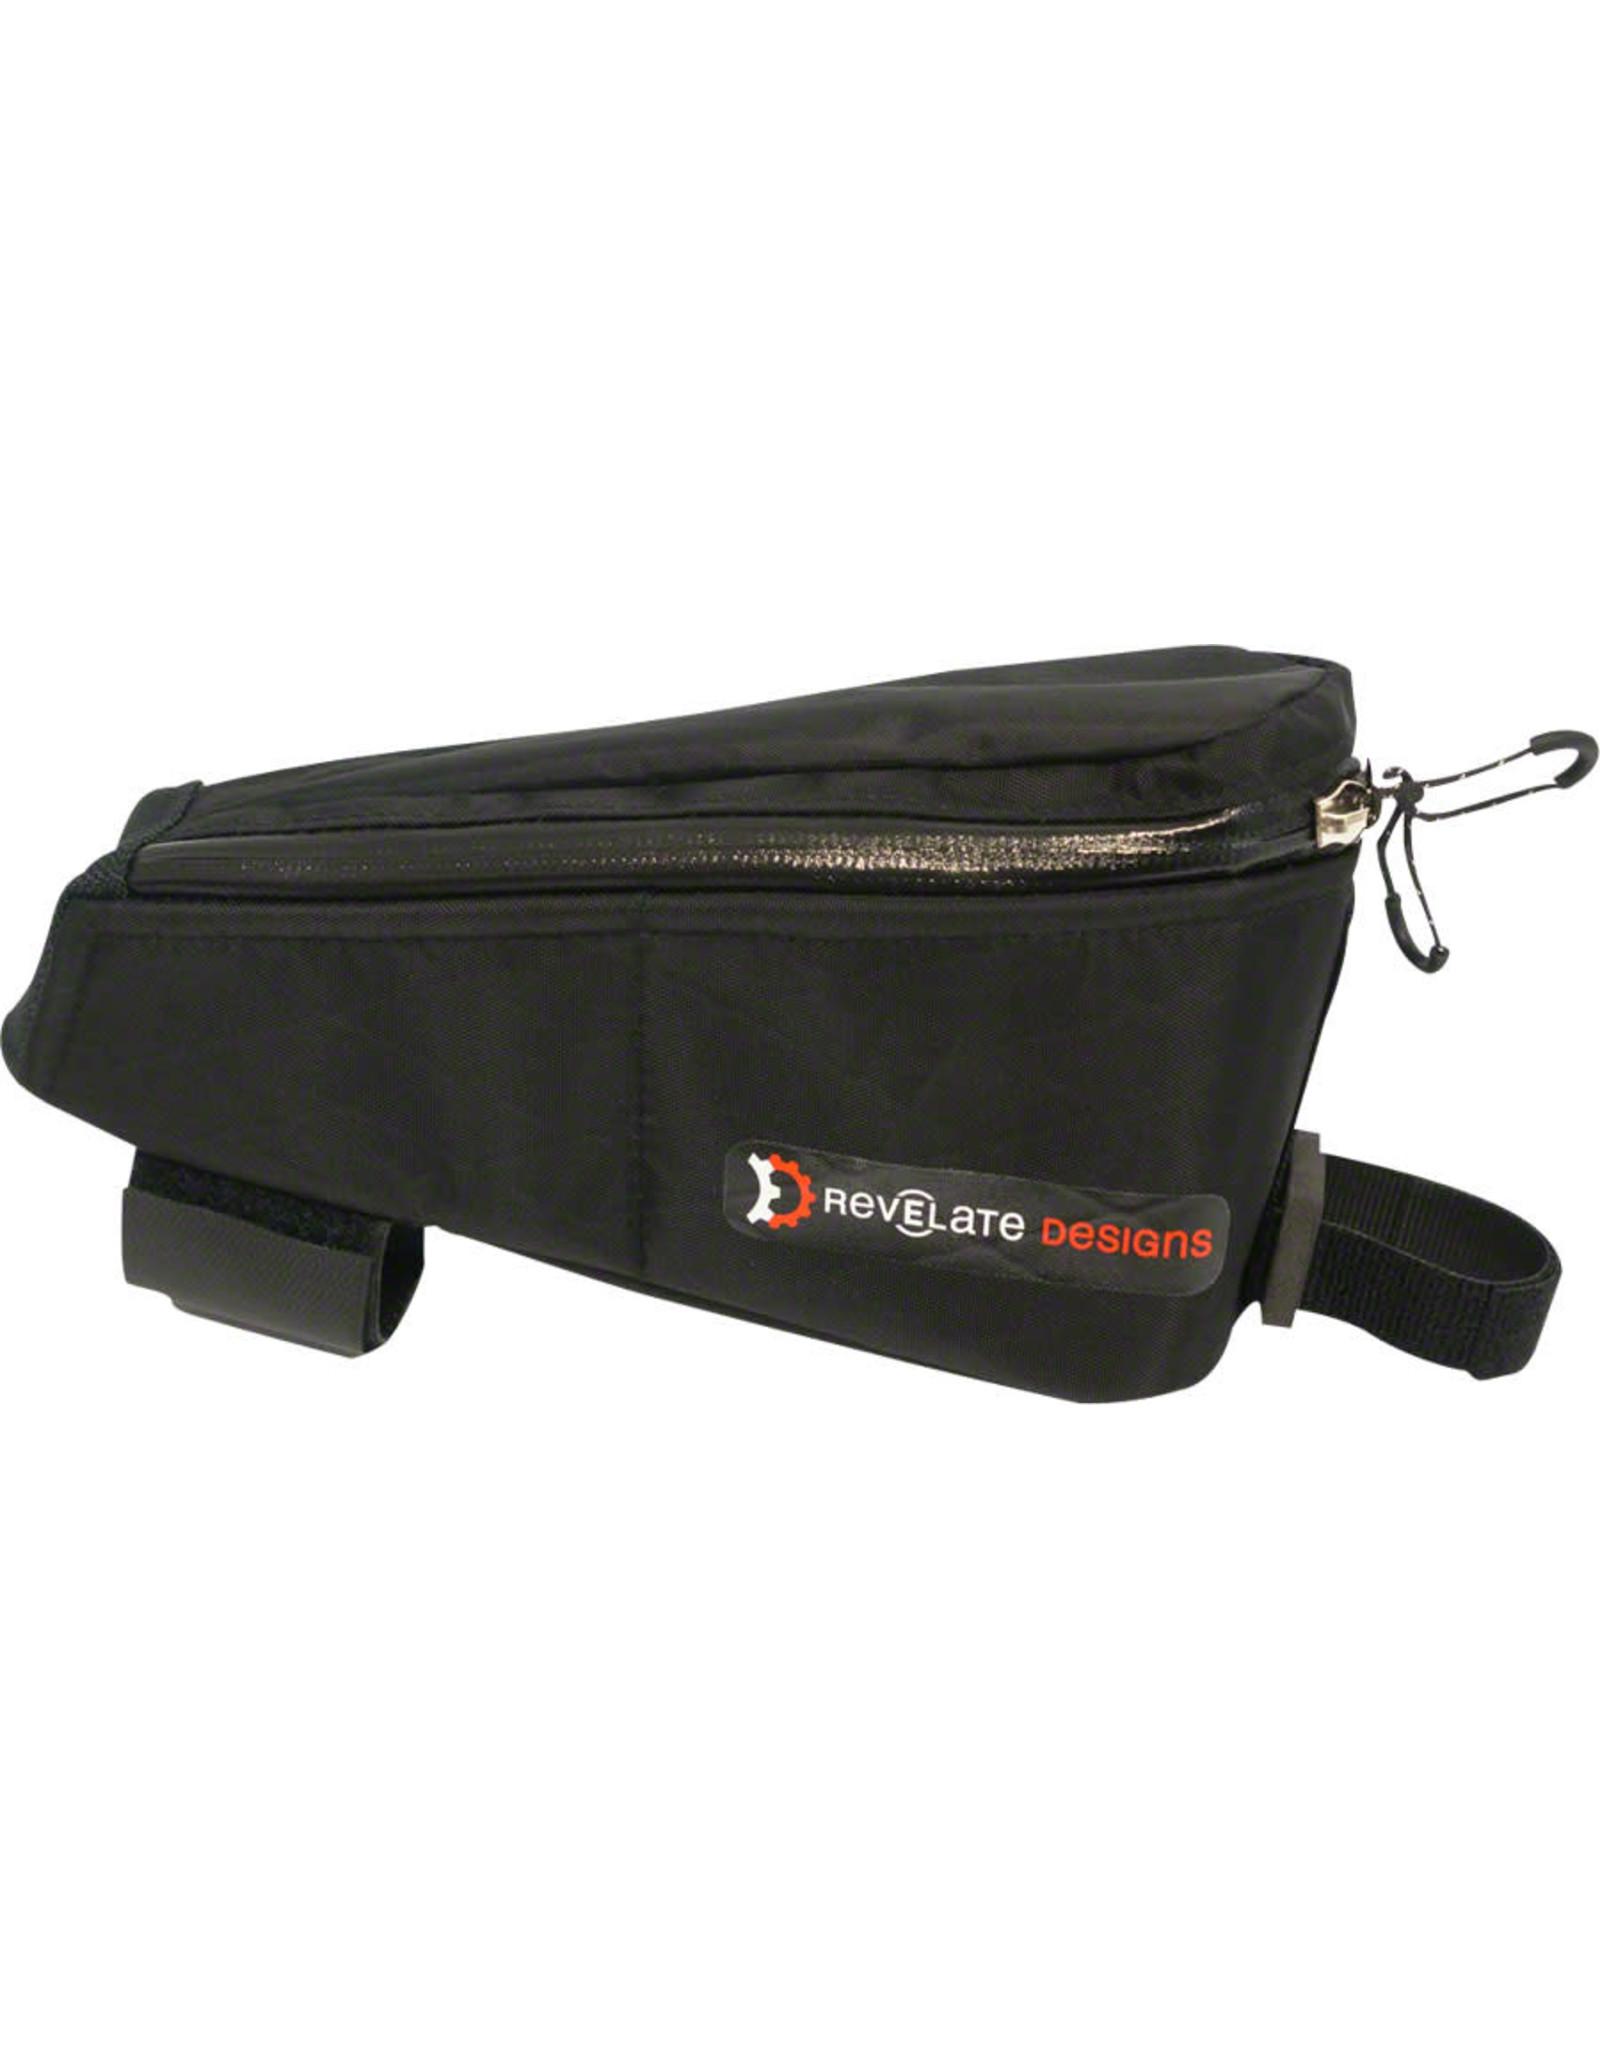 Revelate Designs Revelate Designs Gas Tank Top Tube Bag - Black